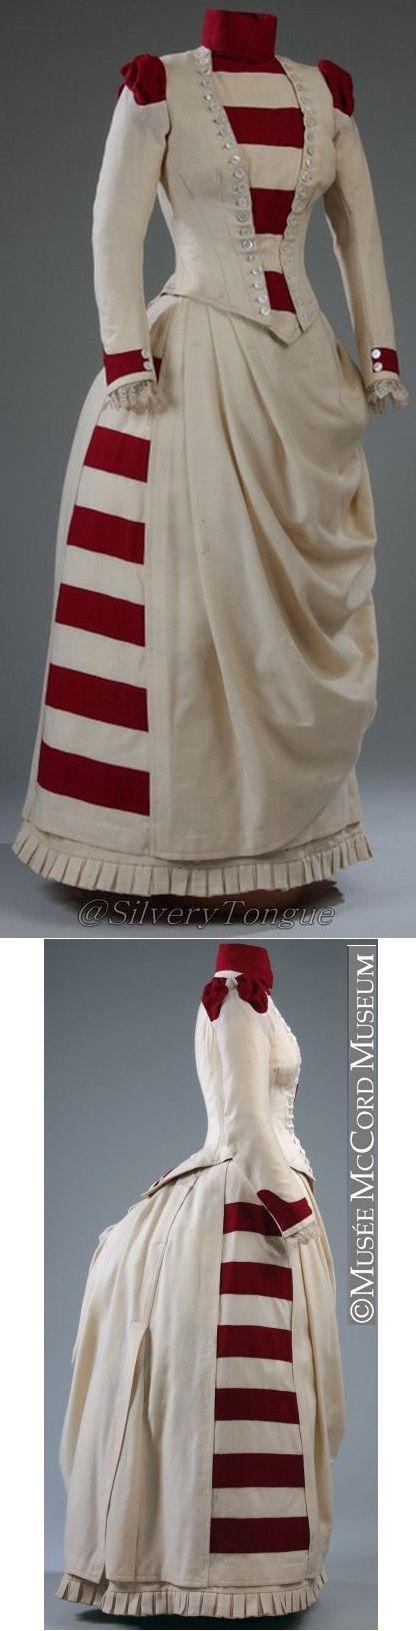 red & white striped 1880s ensemble. http://thedreamstress.com/2017/03/rate-the-dress-a-red-white-striped-1880s-ensemble/